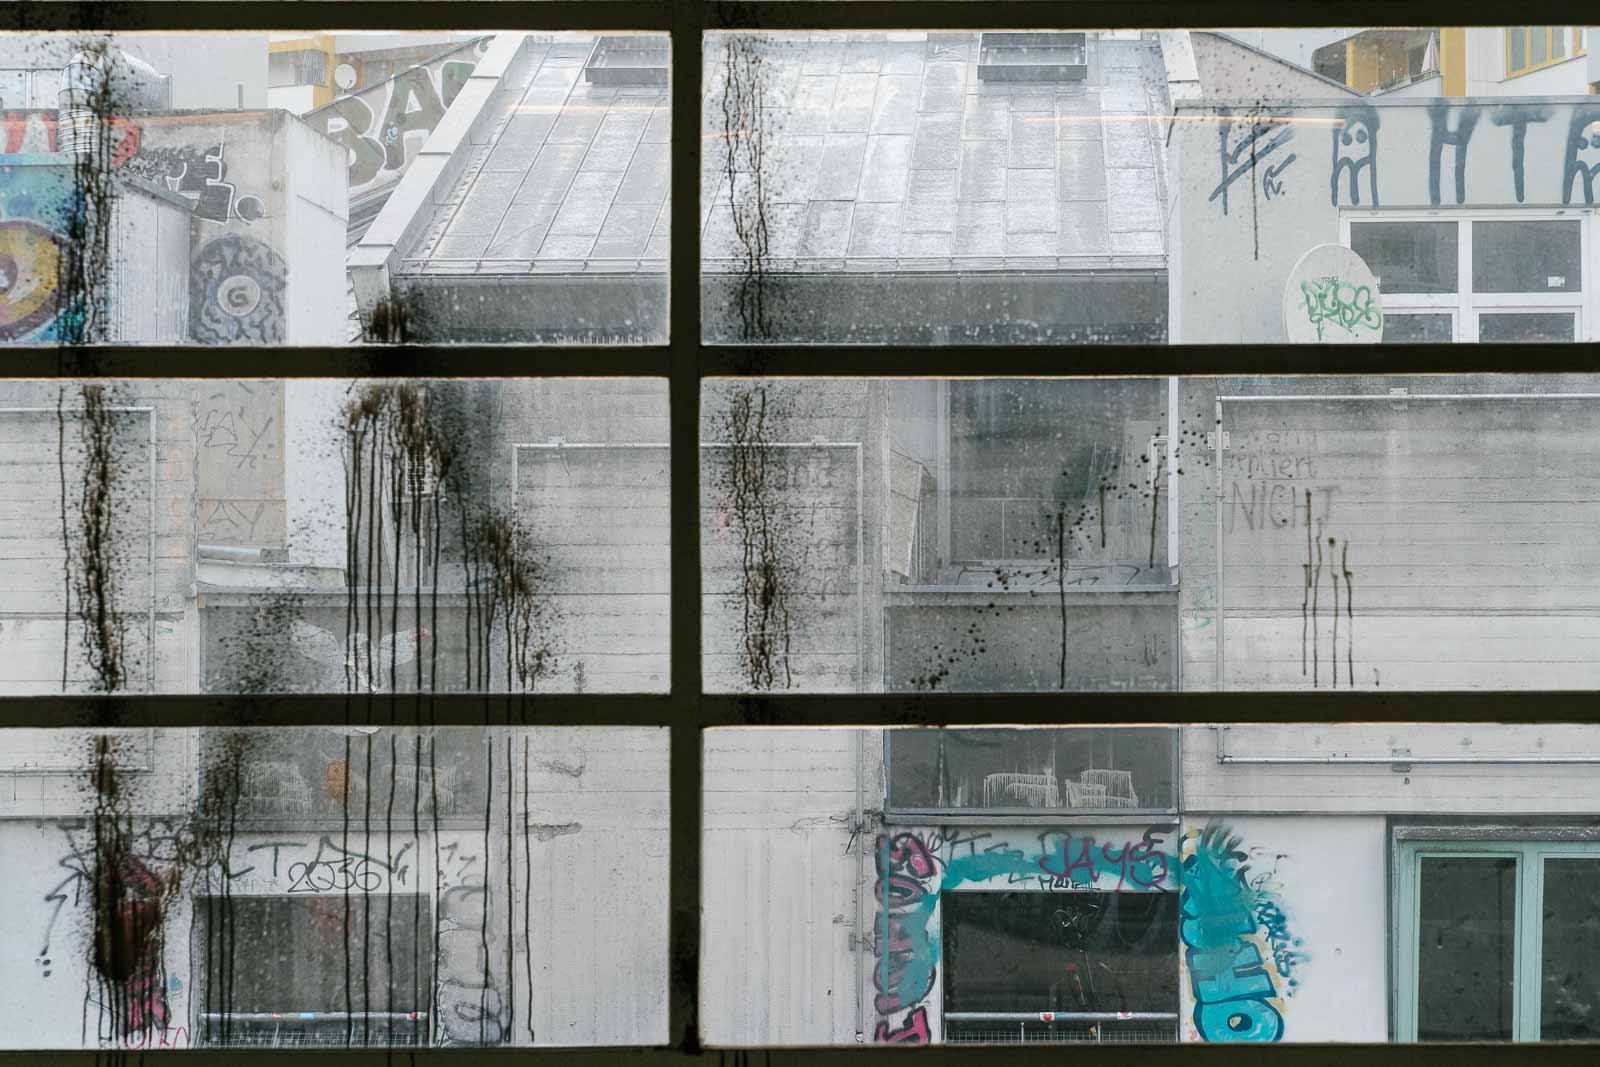 urban photography Berlin Martin U Waltz